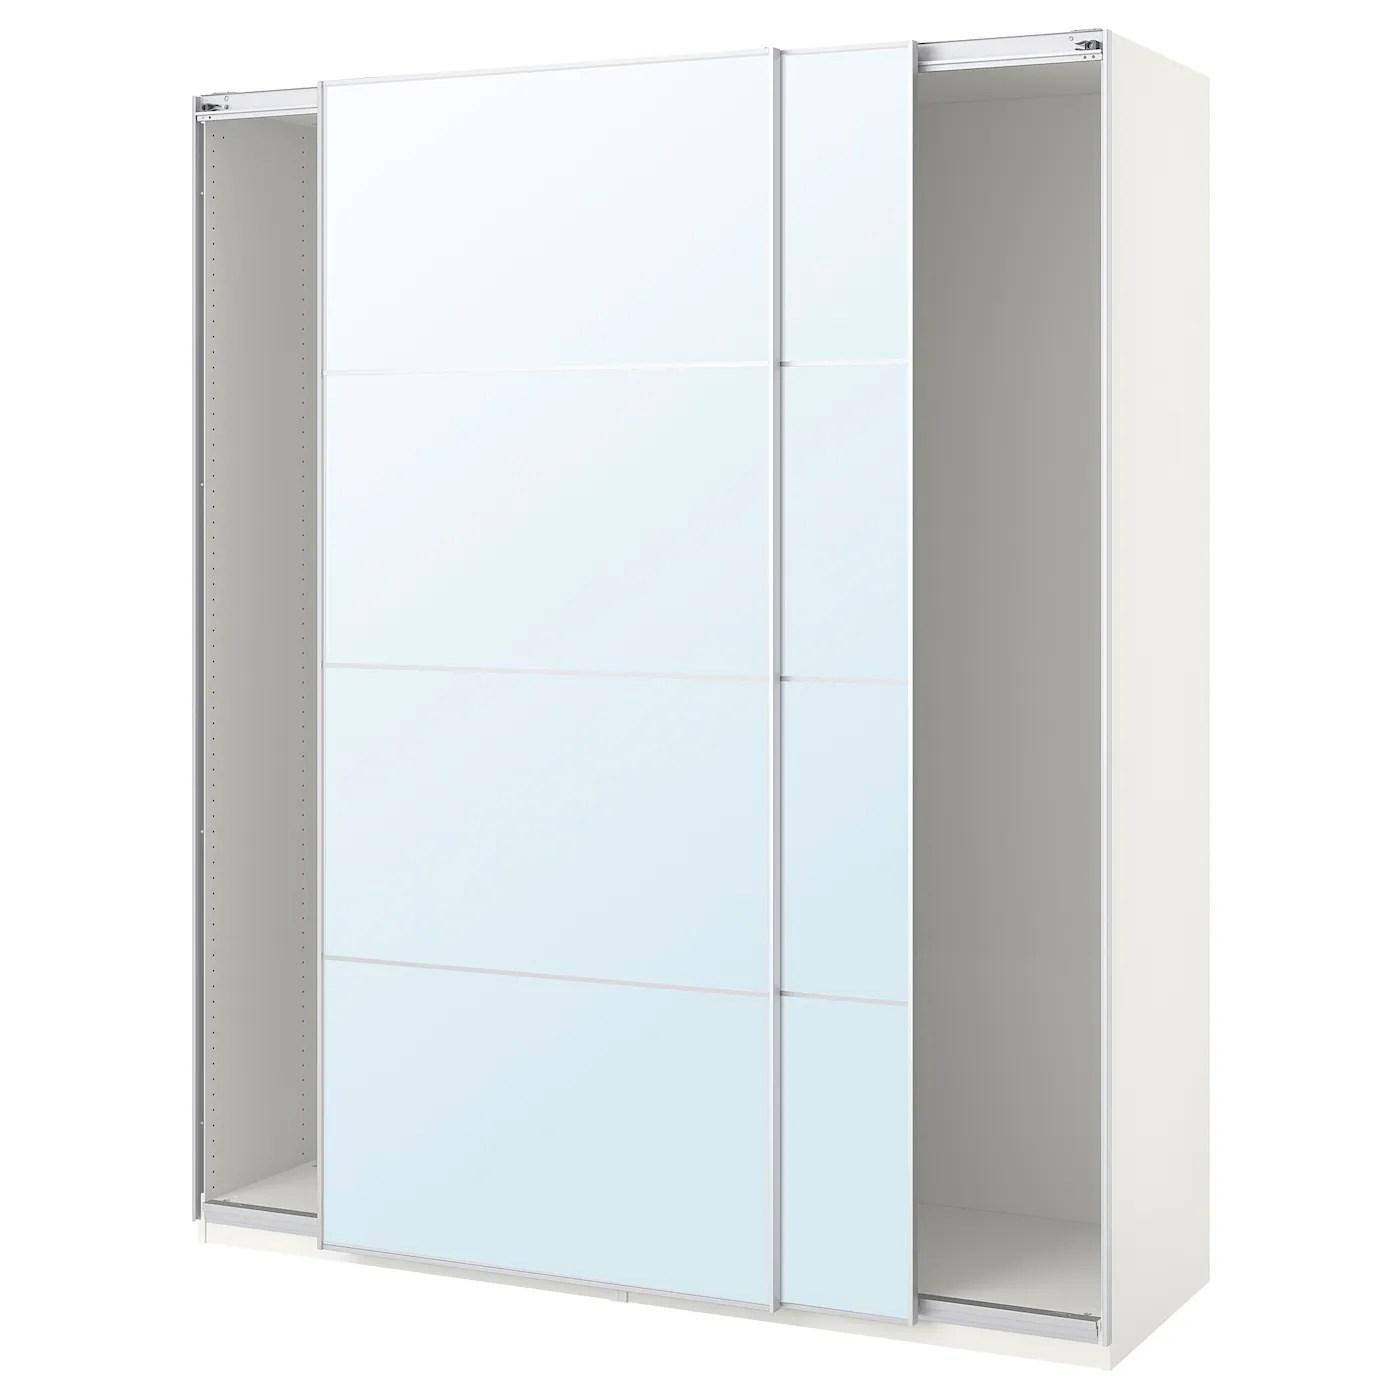 Witte Kledingkast Met Spiegel.Ikea Kledingkast Met Spiegel Ikea Kast Hemnes